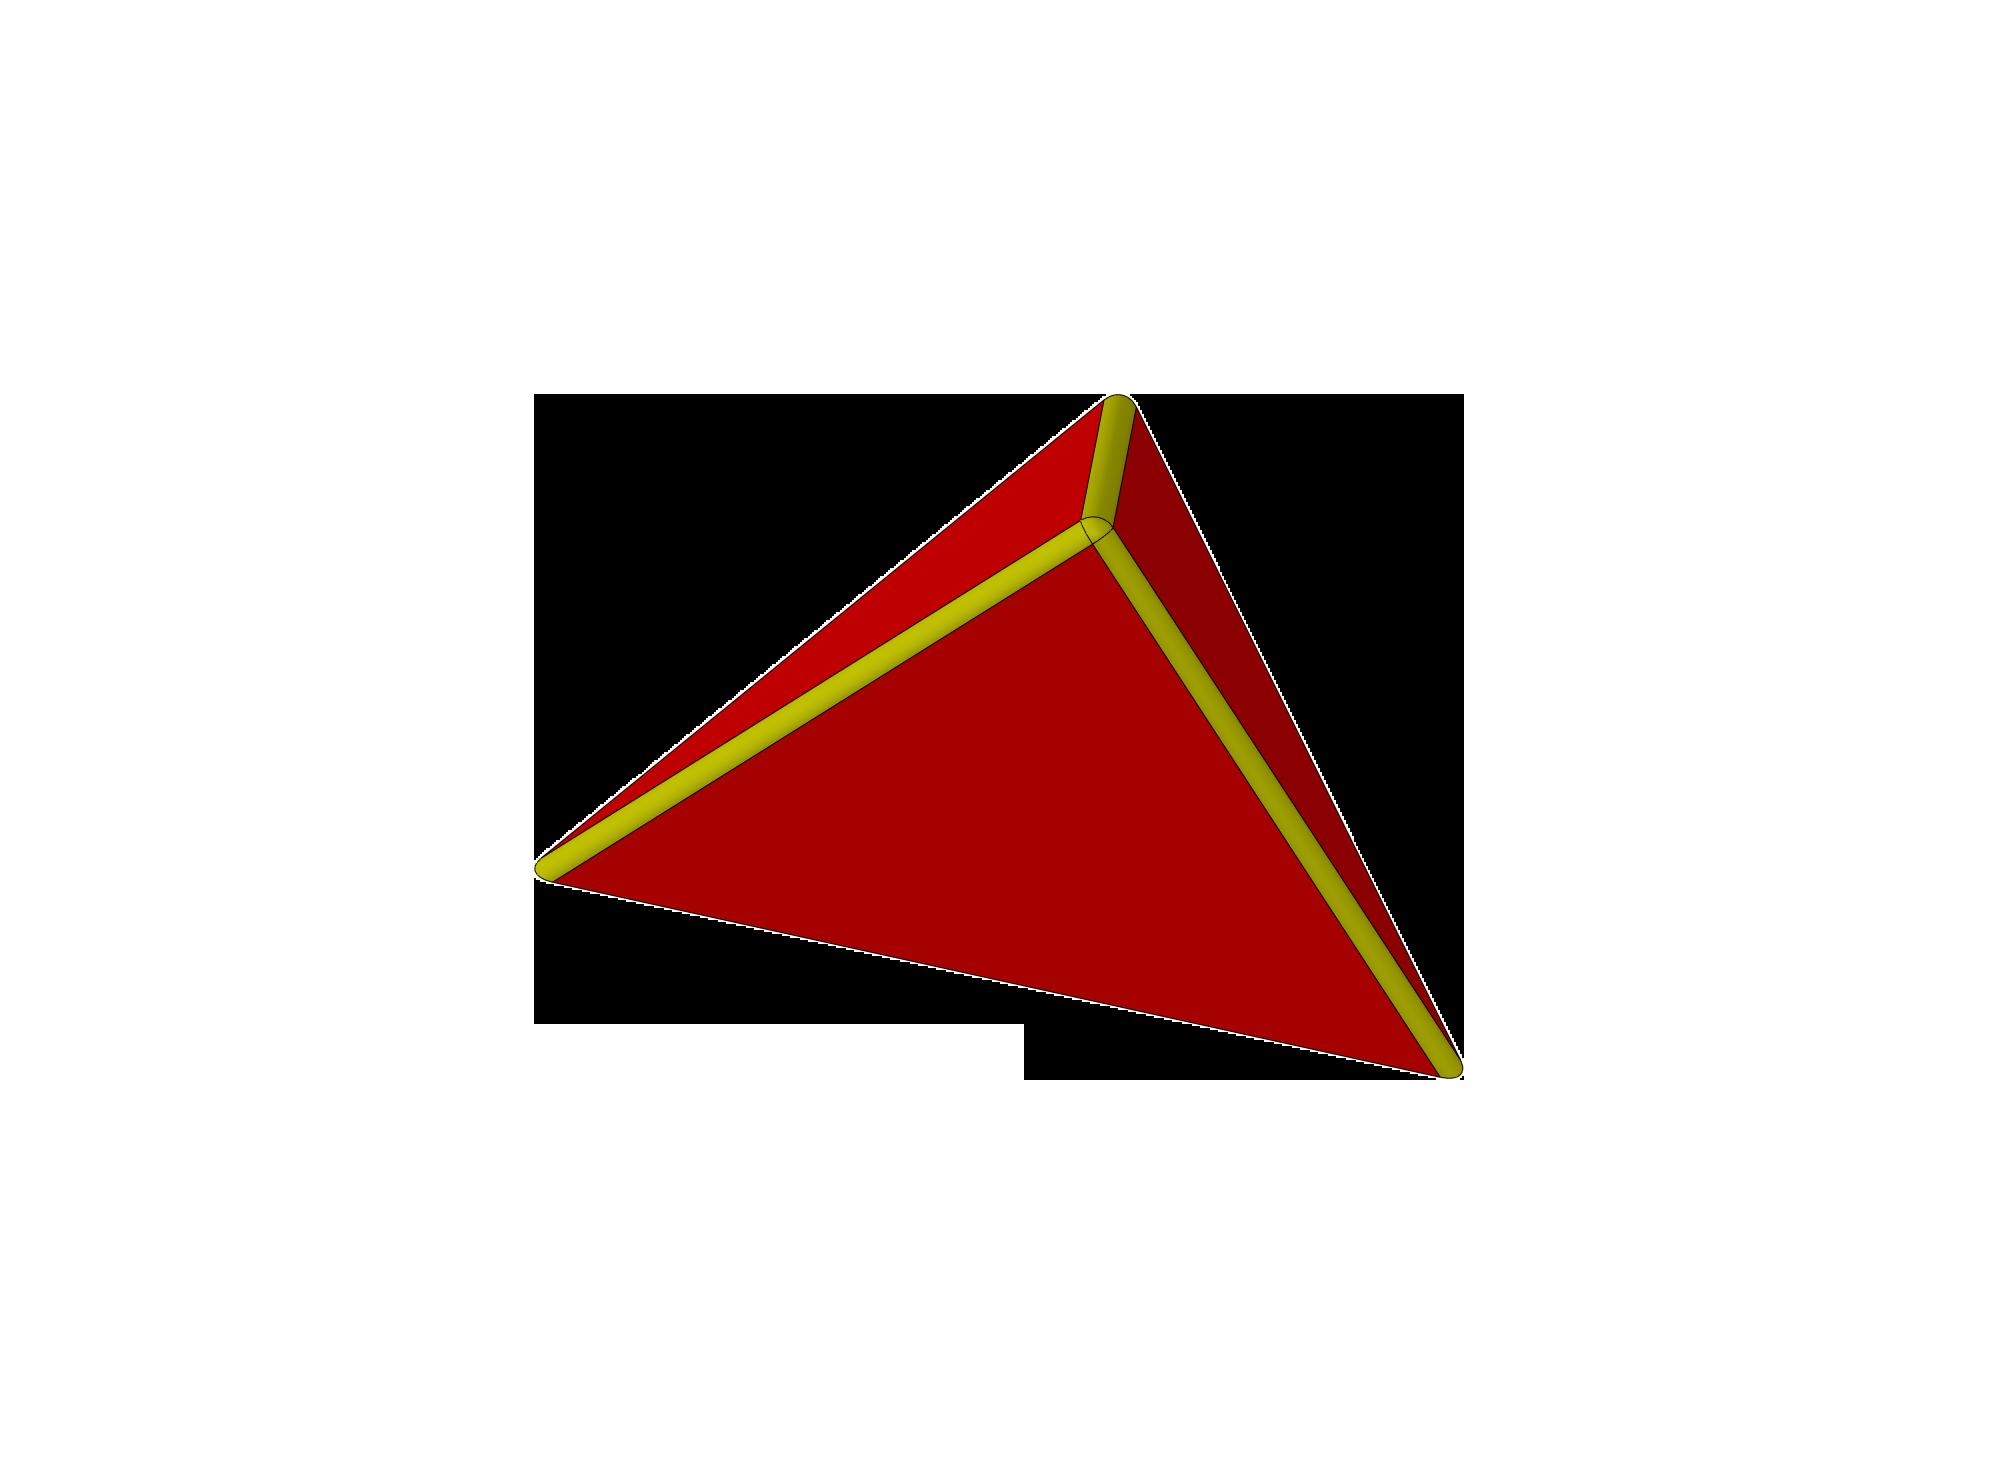 Blocz - Dreieck 300